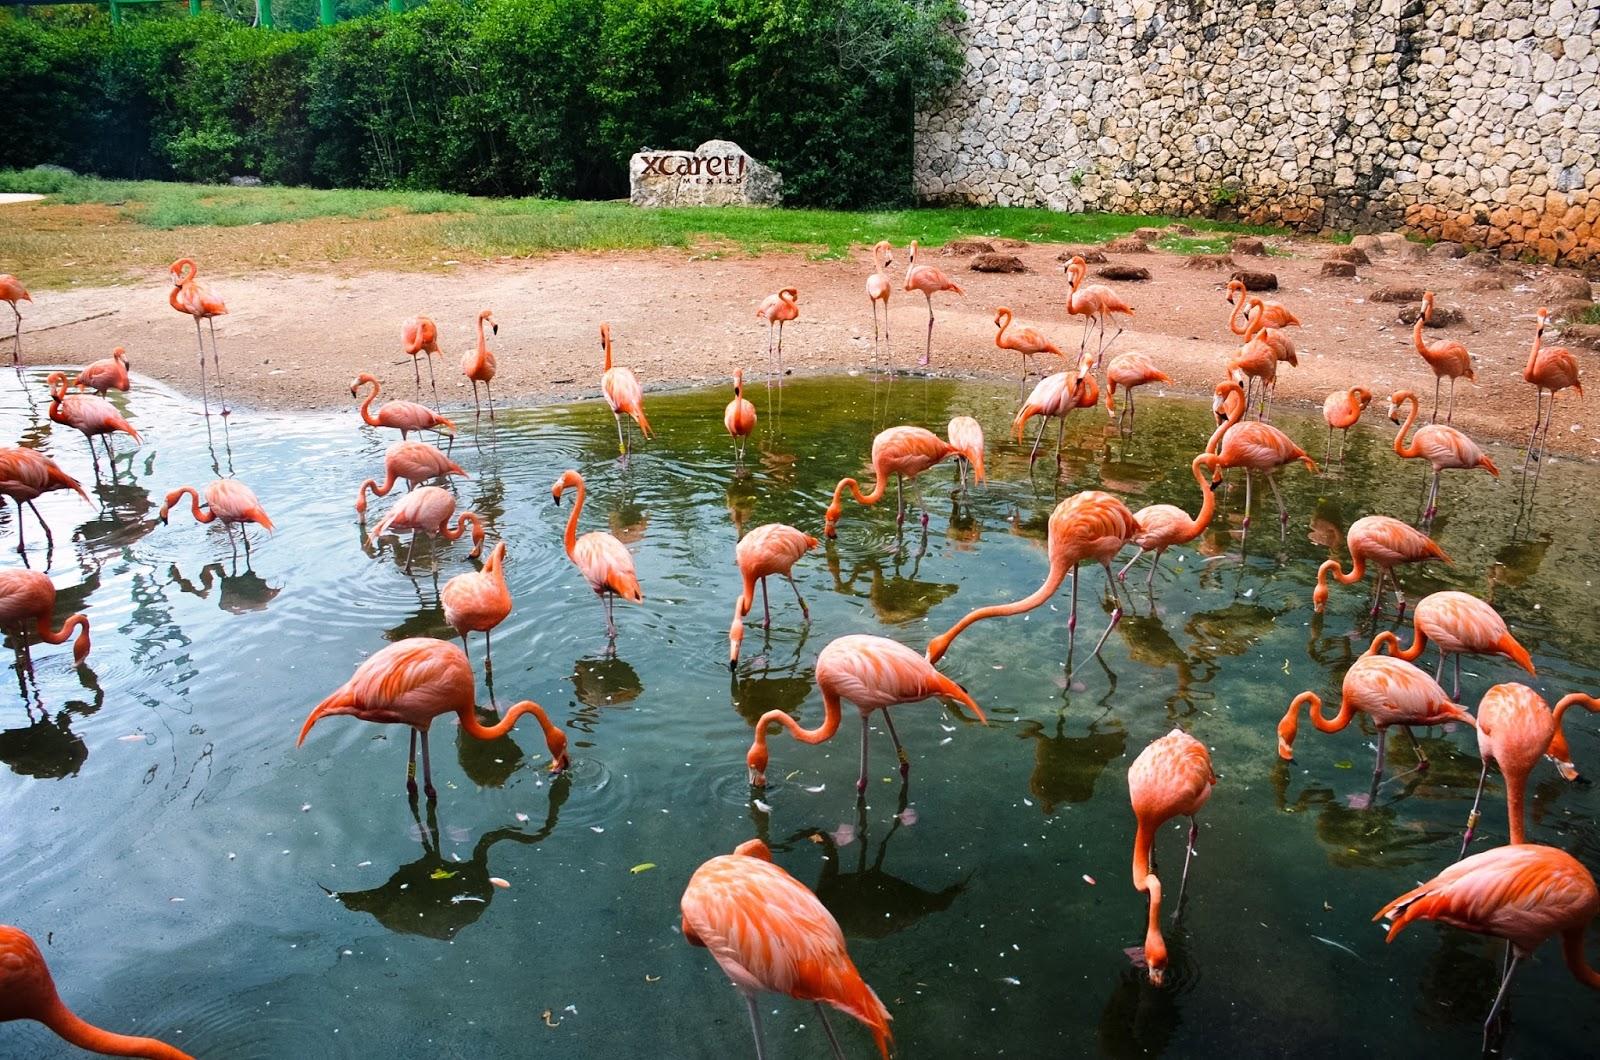 xcaret flamingo sanctuary